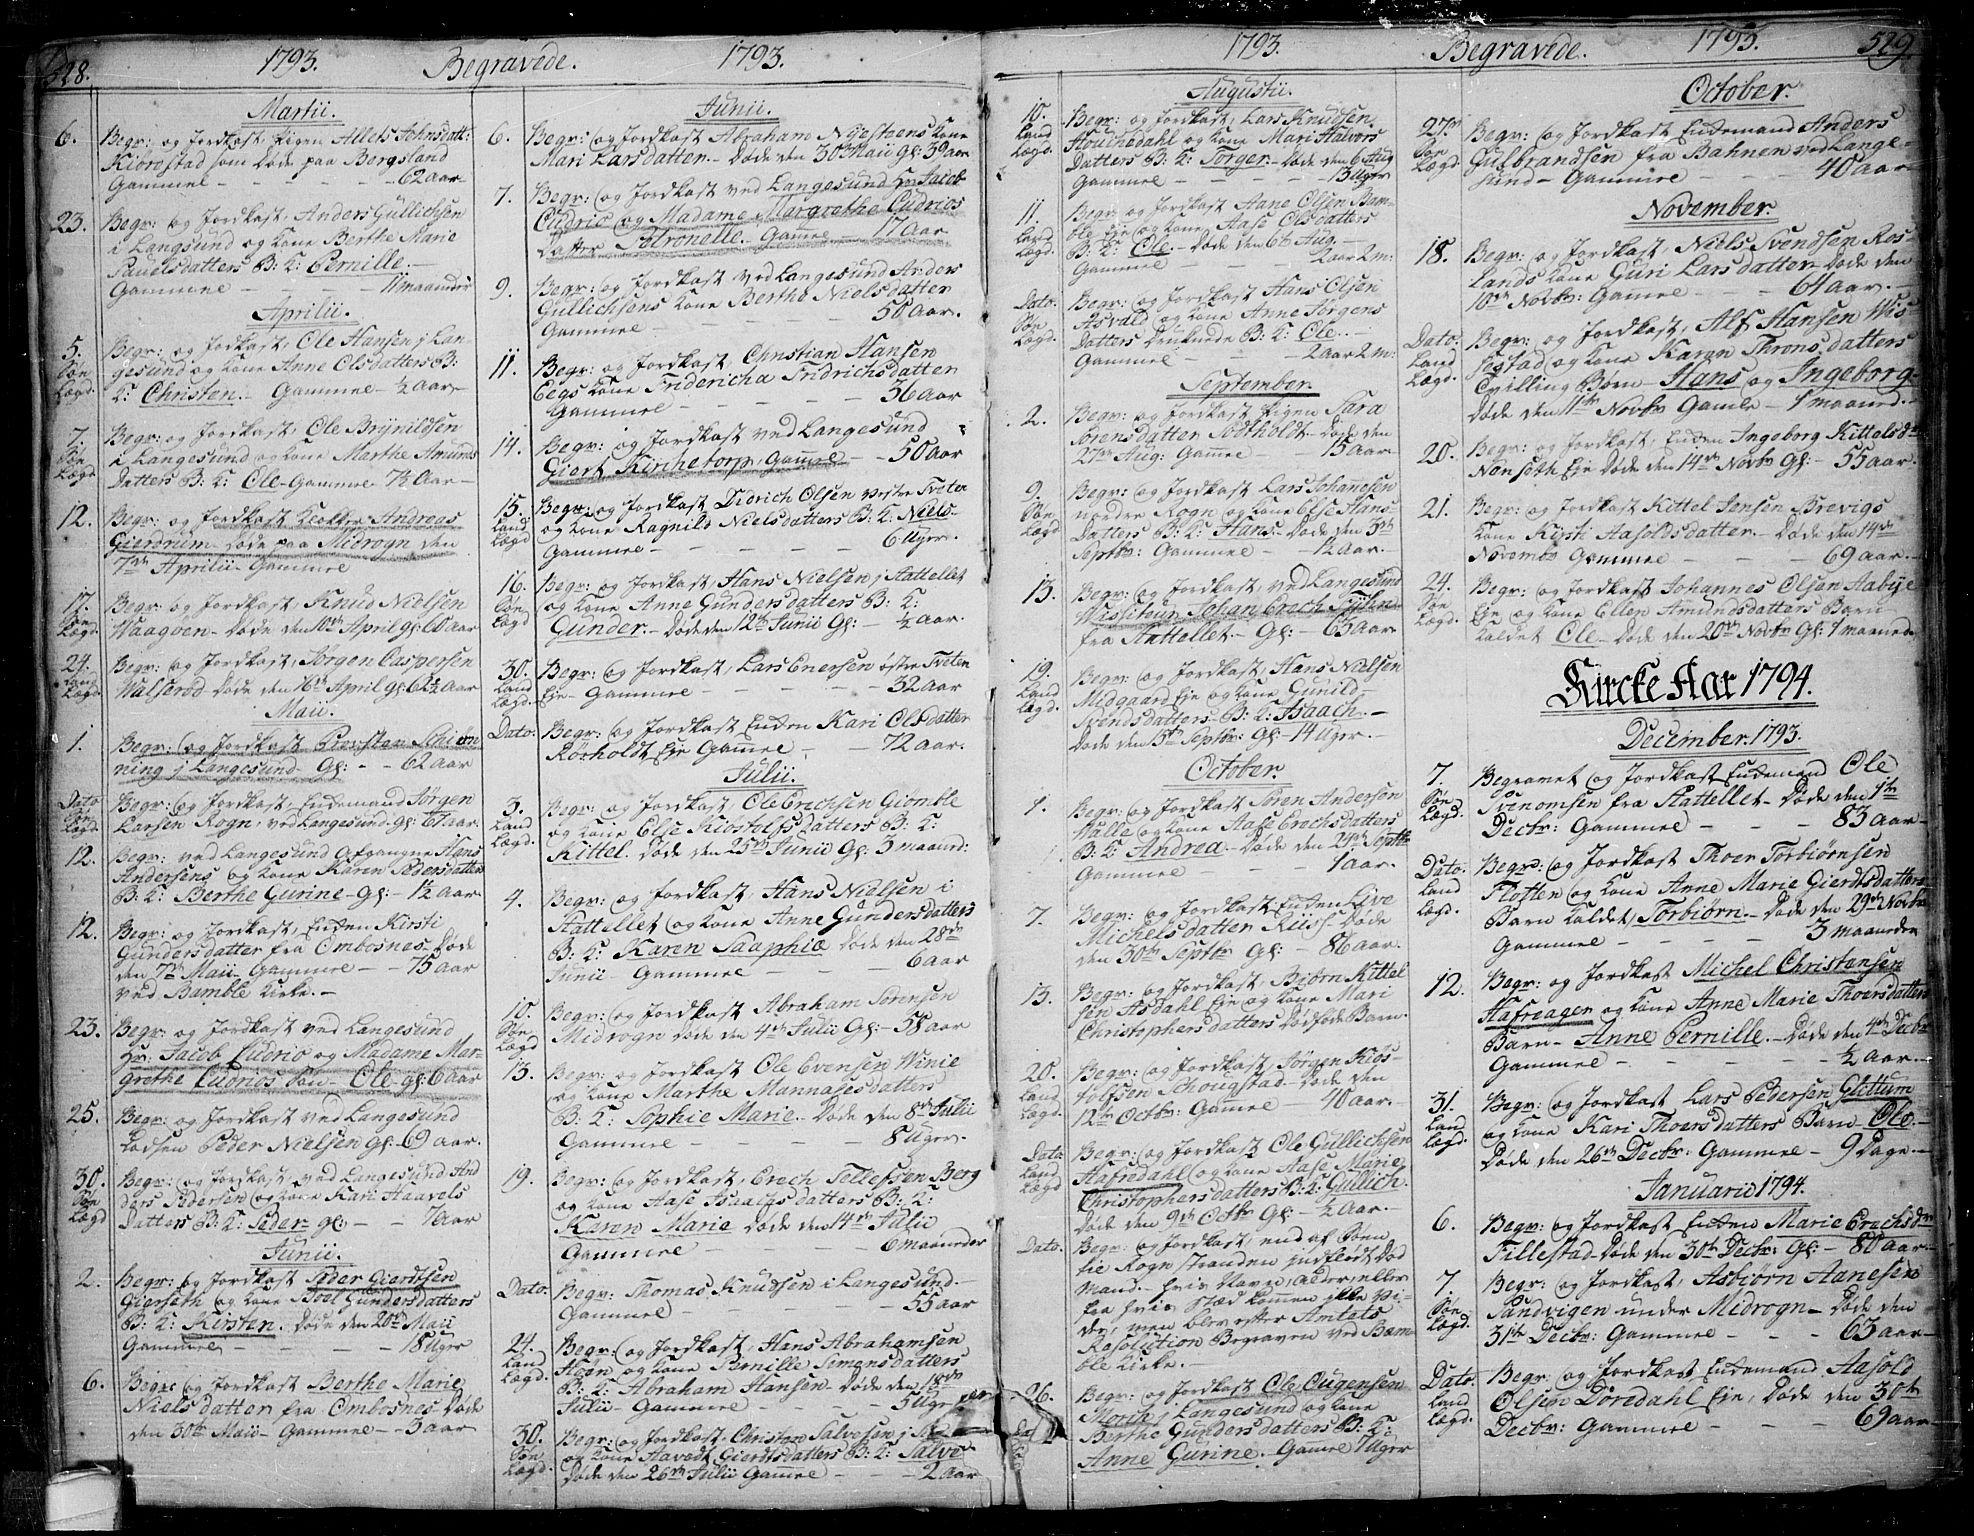 SAKO, Bamble kirkebøker, F/Fa/L0002: Ministerialbok nr. I 2, 1775-1814, s. 528-529